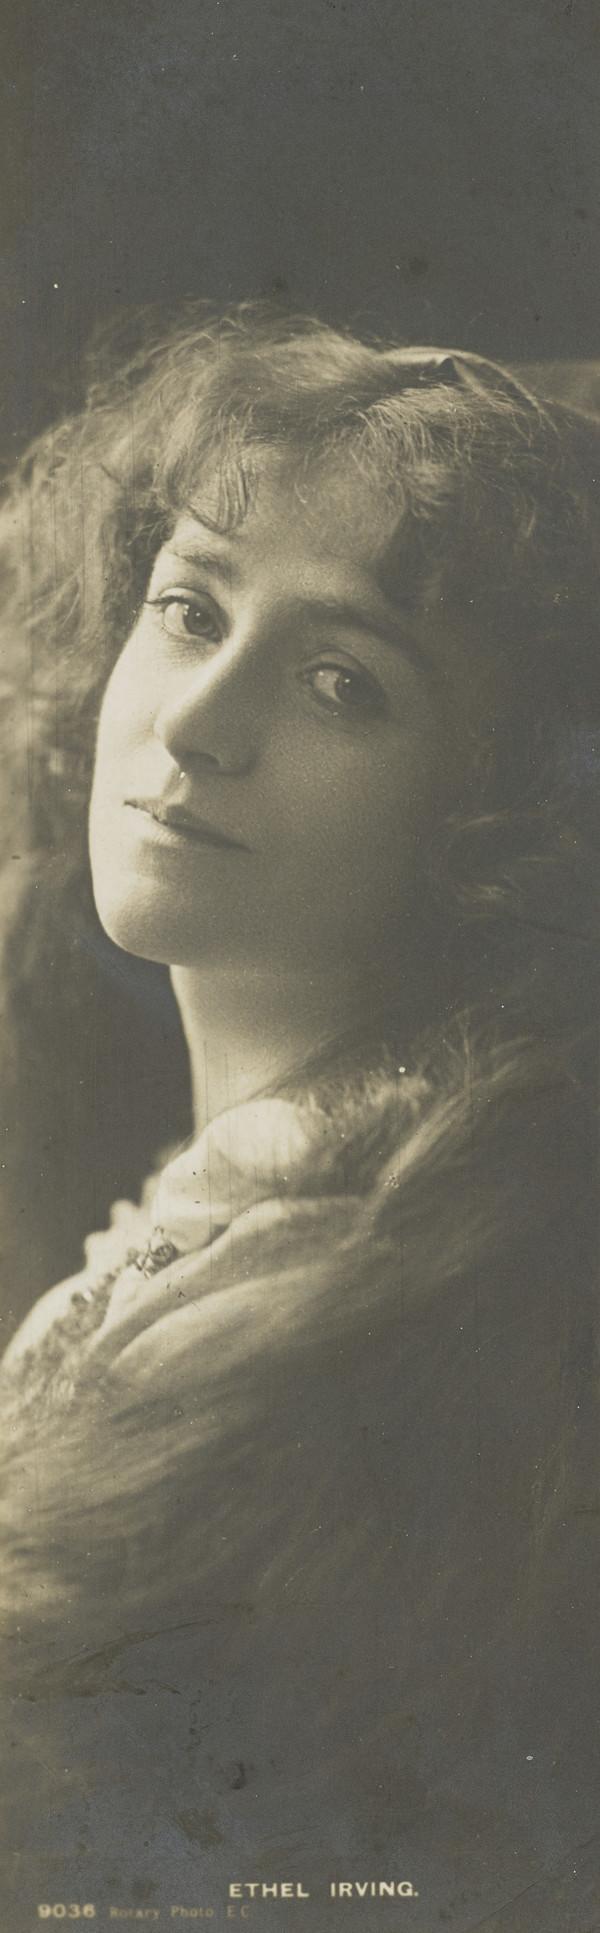 Watch Ethel Irving video